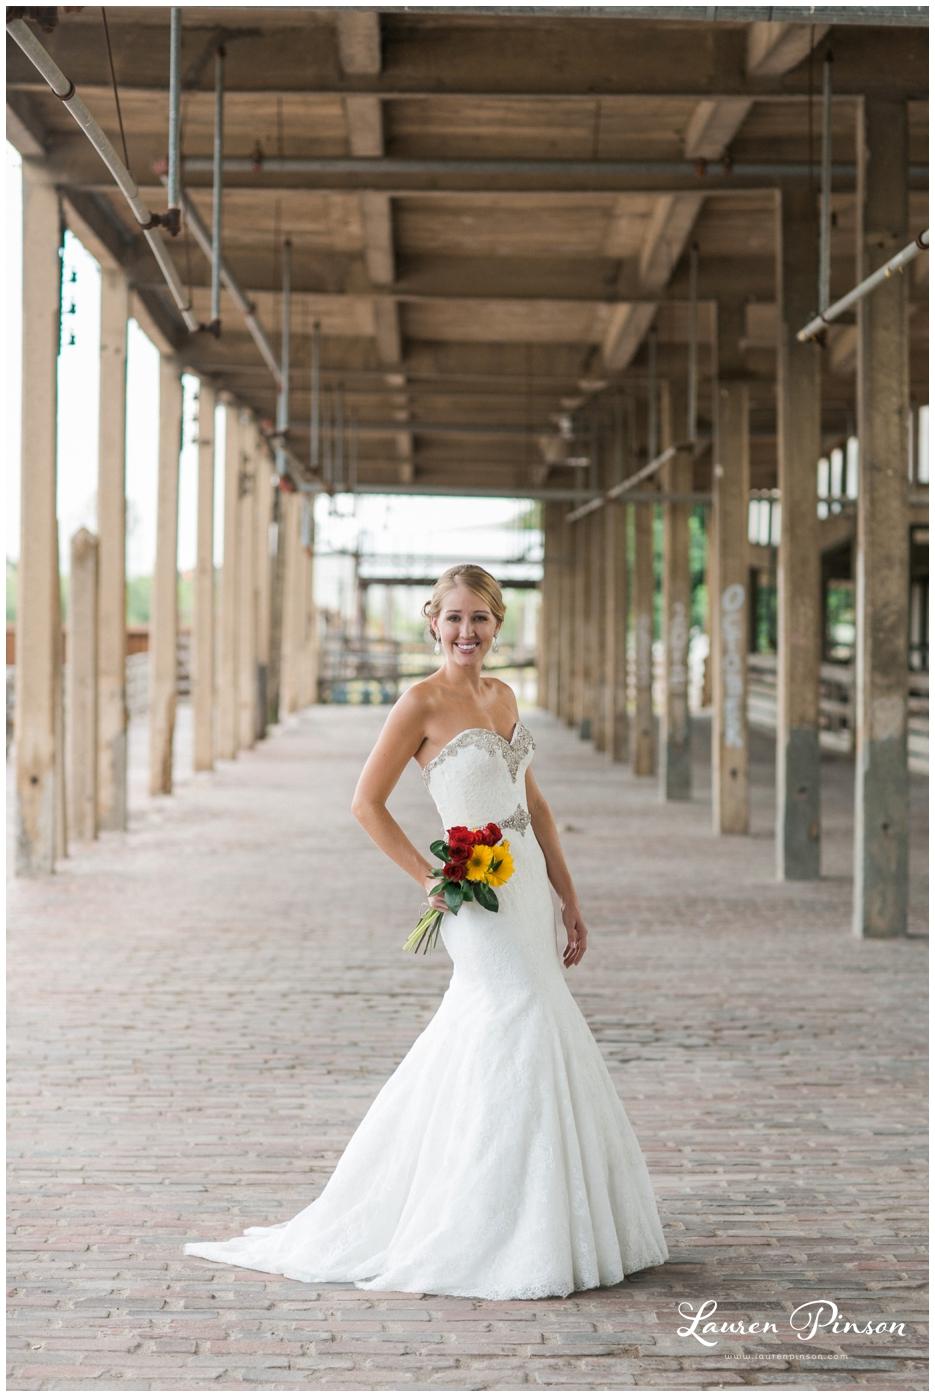 fort-worth-bridal-session-at-the-stockyards-fort-worth-wedding-photographer-wichita-falls-wedding-photographer_1328.jpg